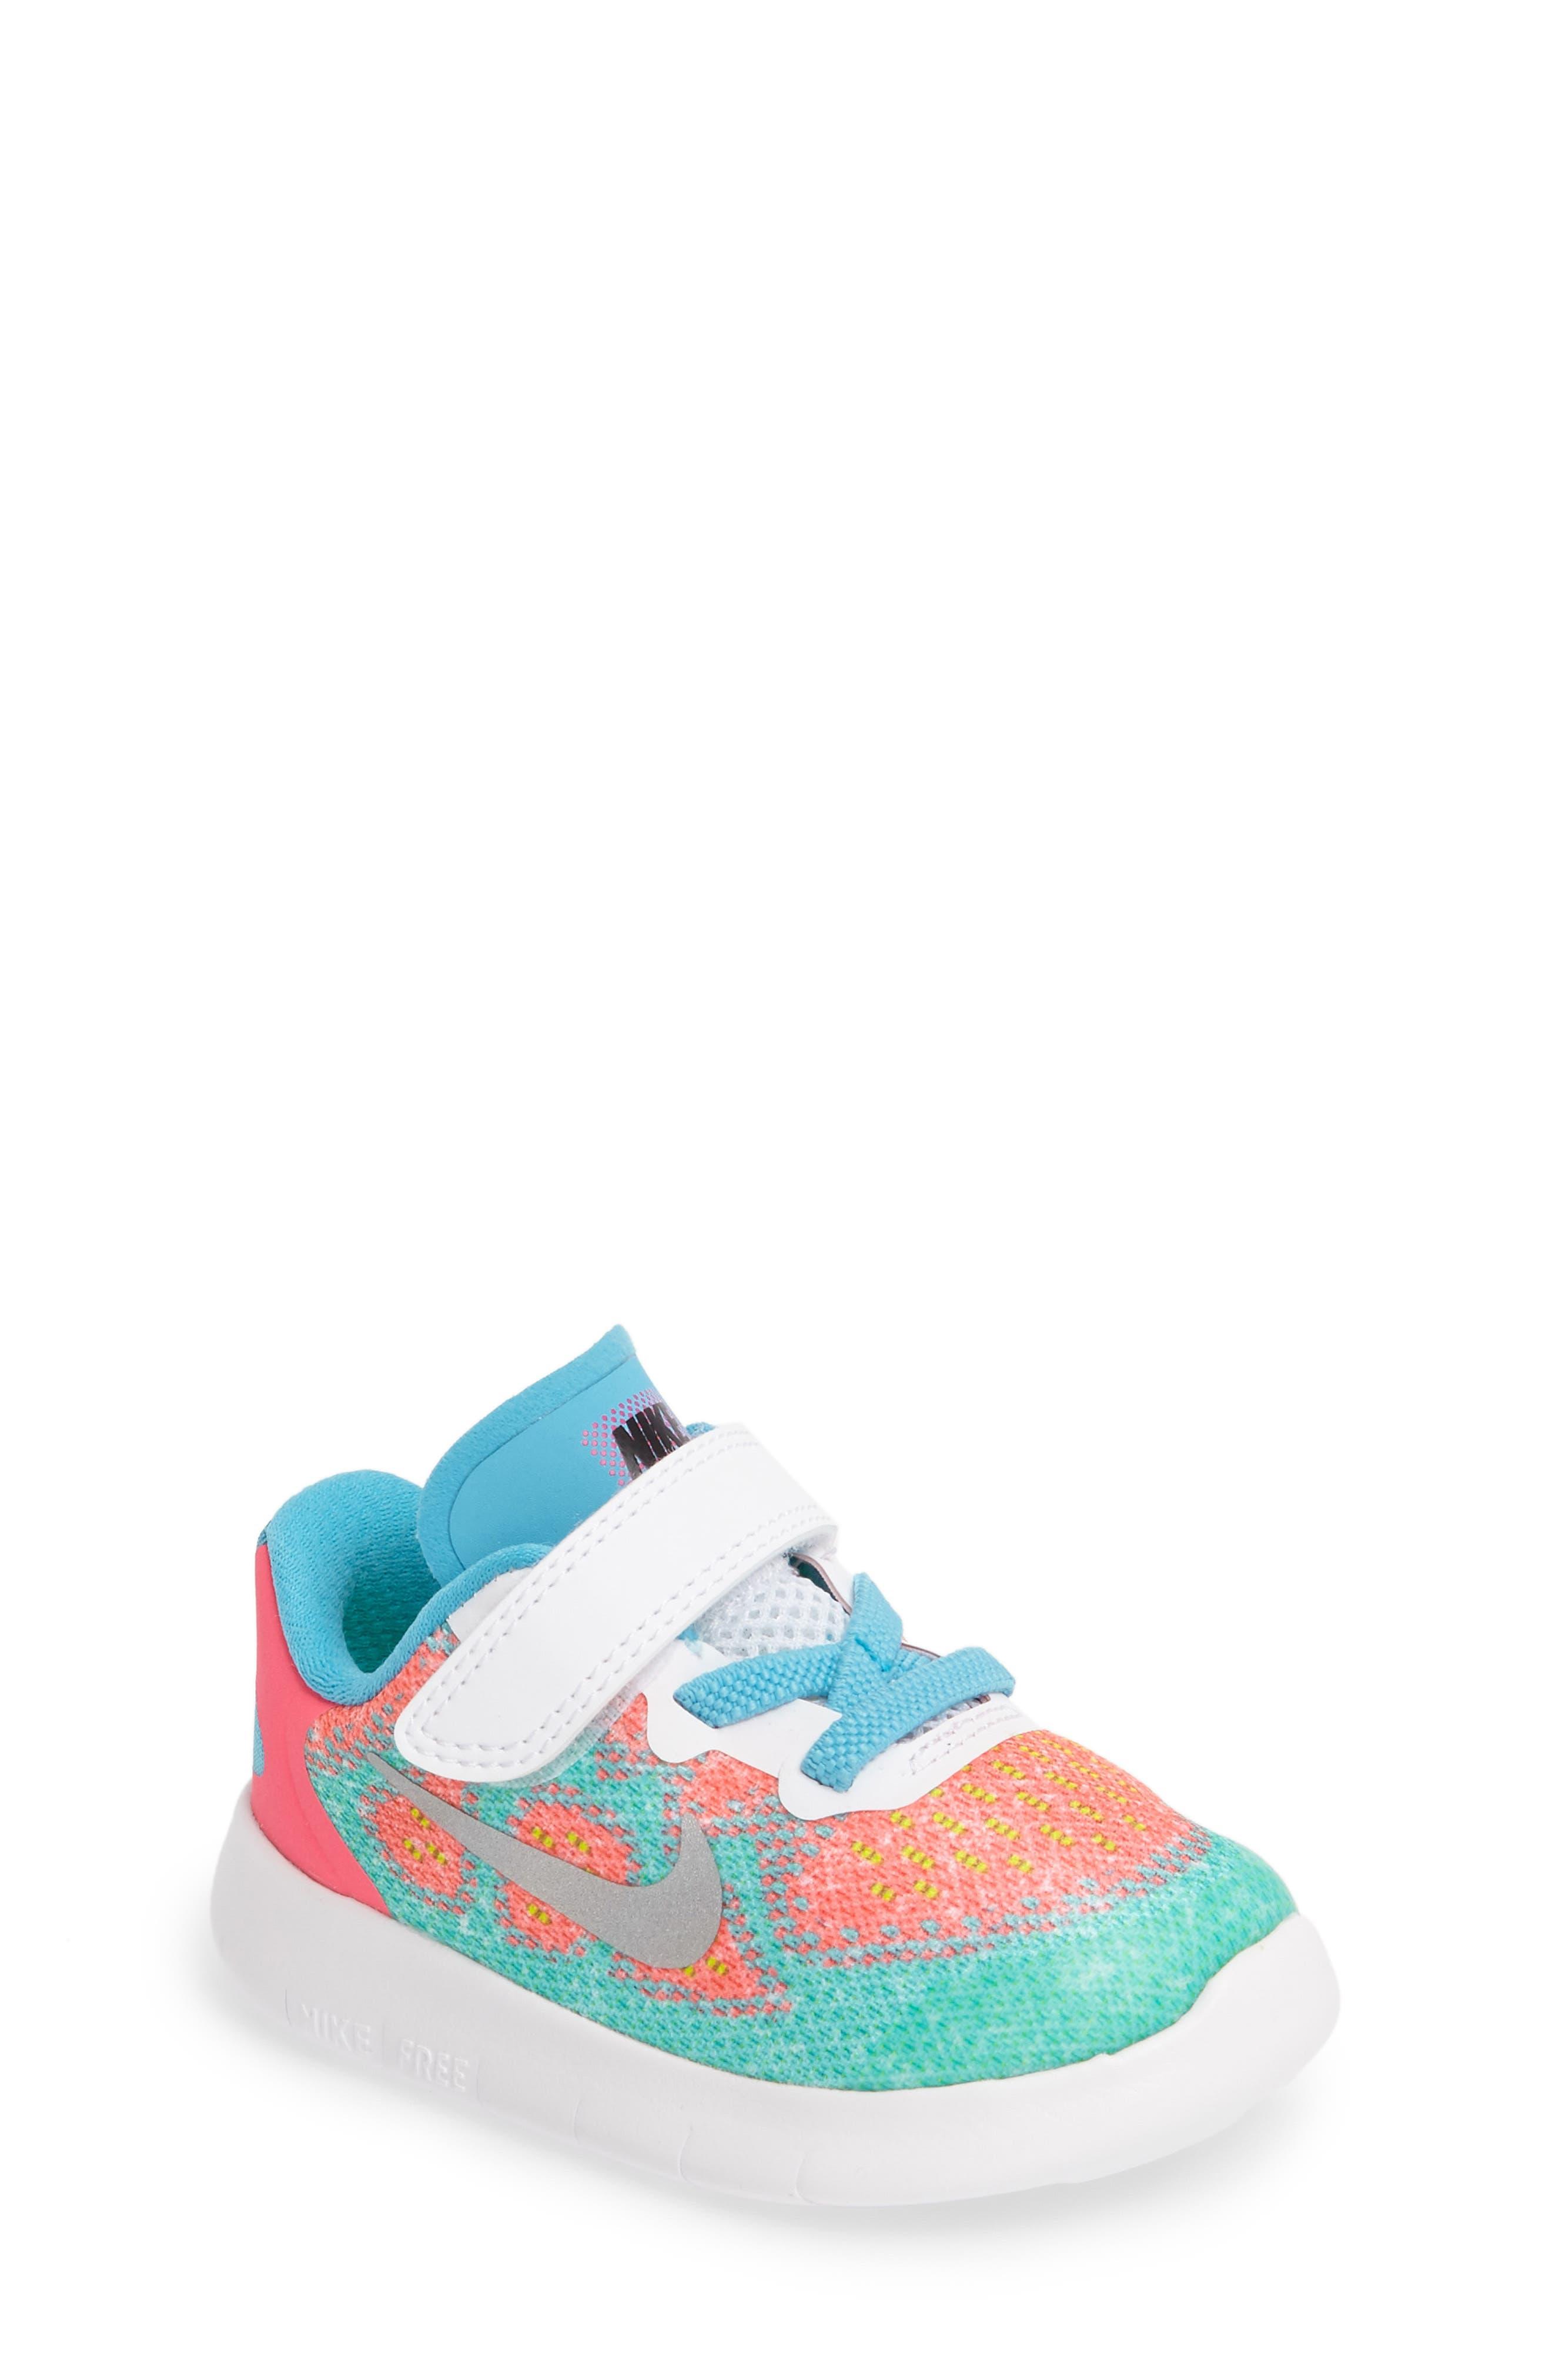 Free Run 2017 Sneaker,                             Main thumbnail 2, color,